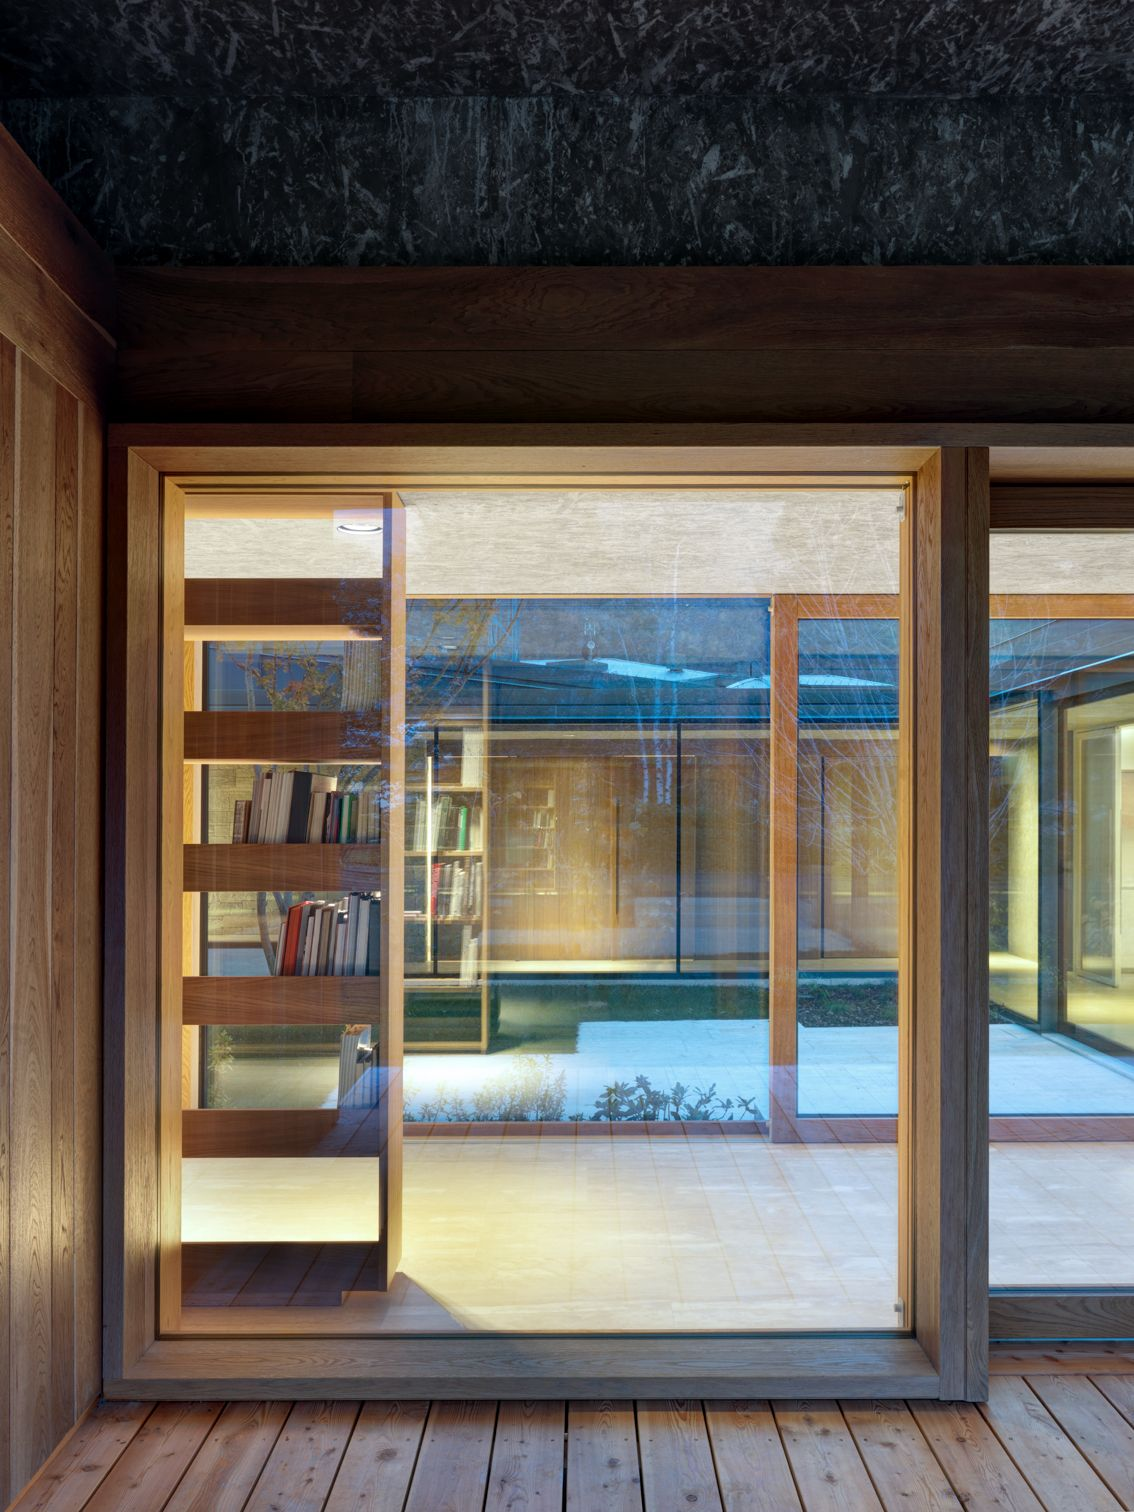 act_romegialli . Private house with patio .  Cosio Valtellino afasia (29)